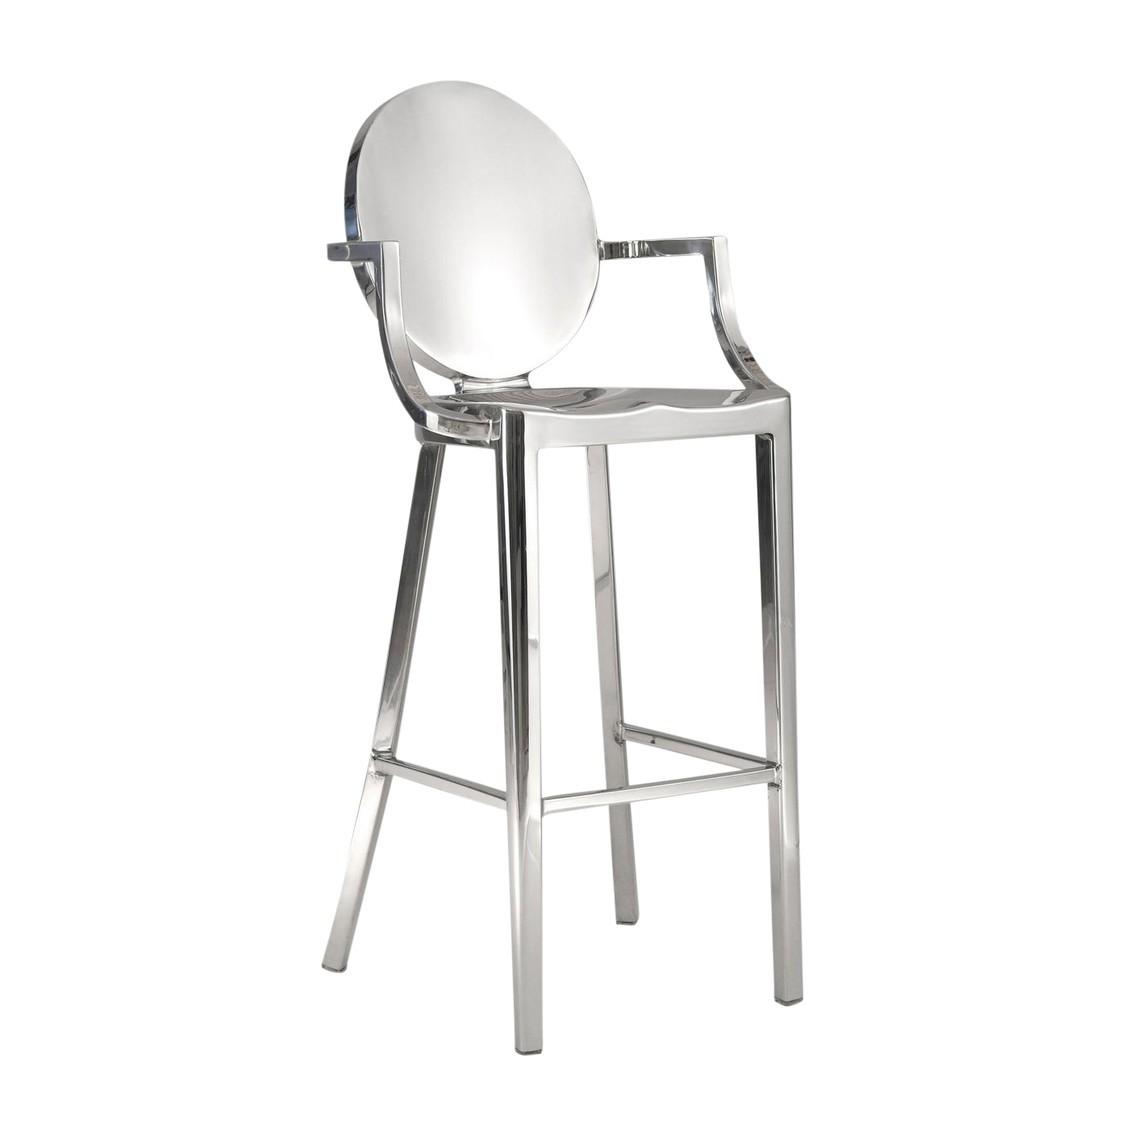 emeco kong barhocker mit armlehnen ambientedirect. Black Bedroom Furniture Sets. Home Design Ideas